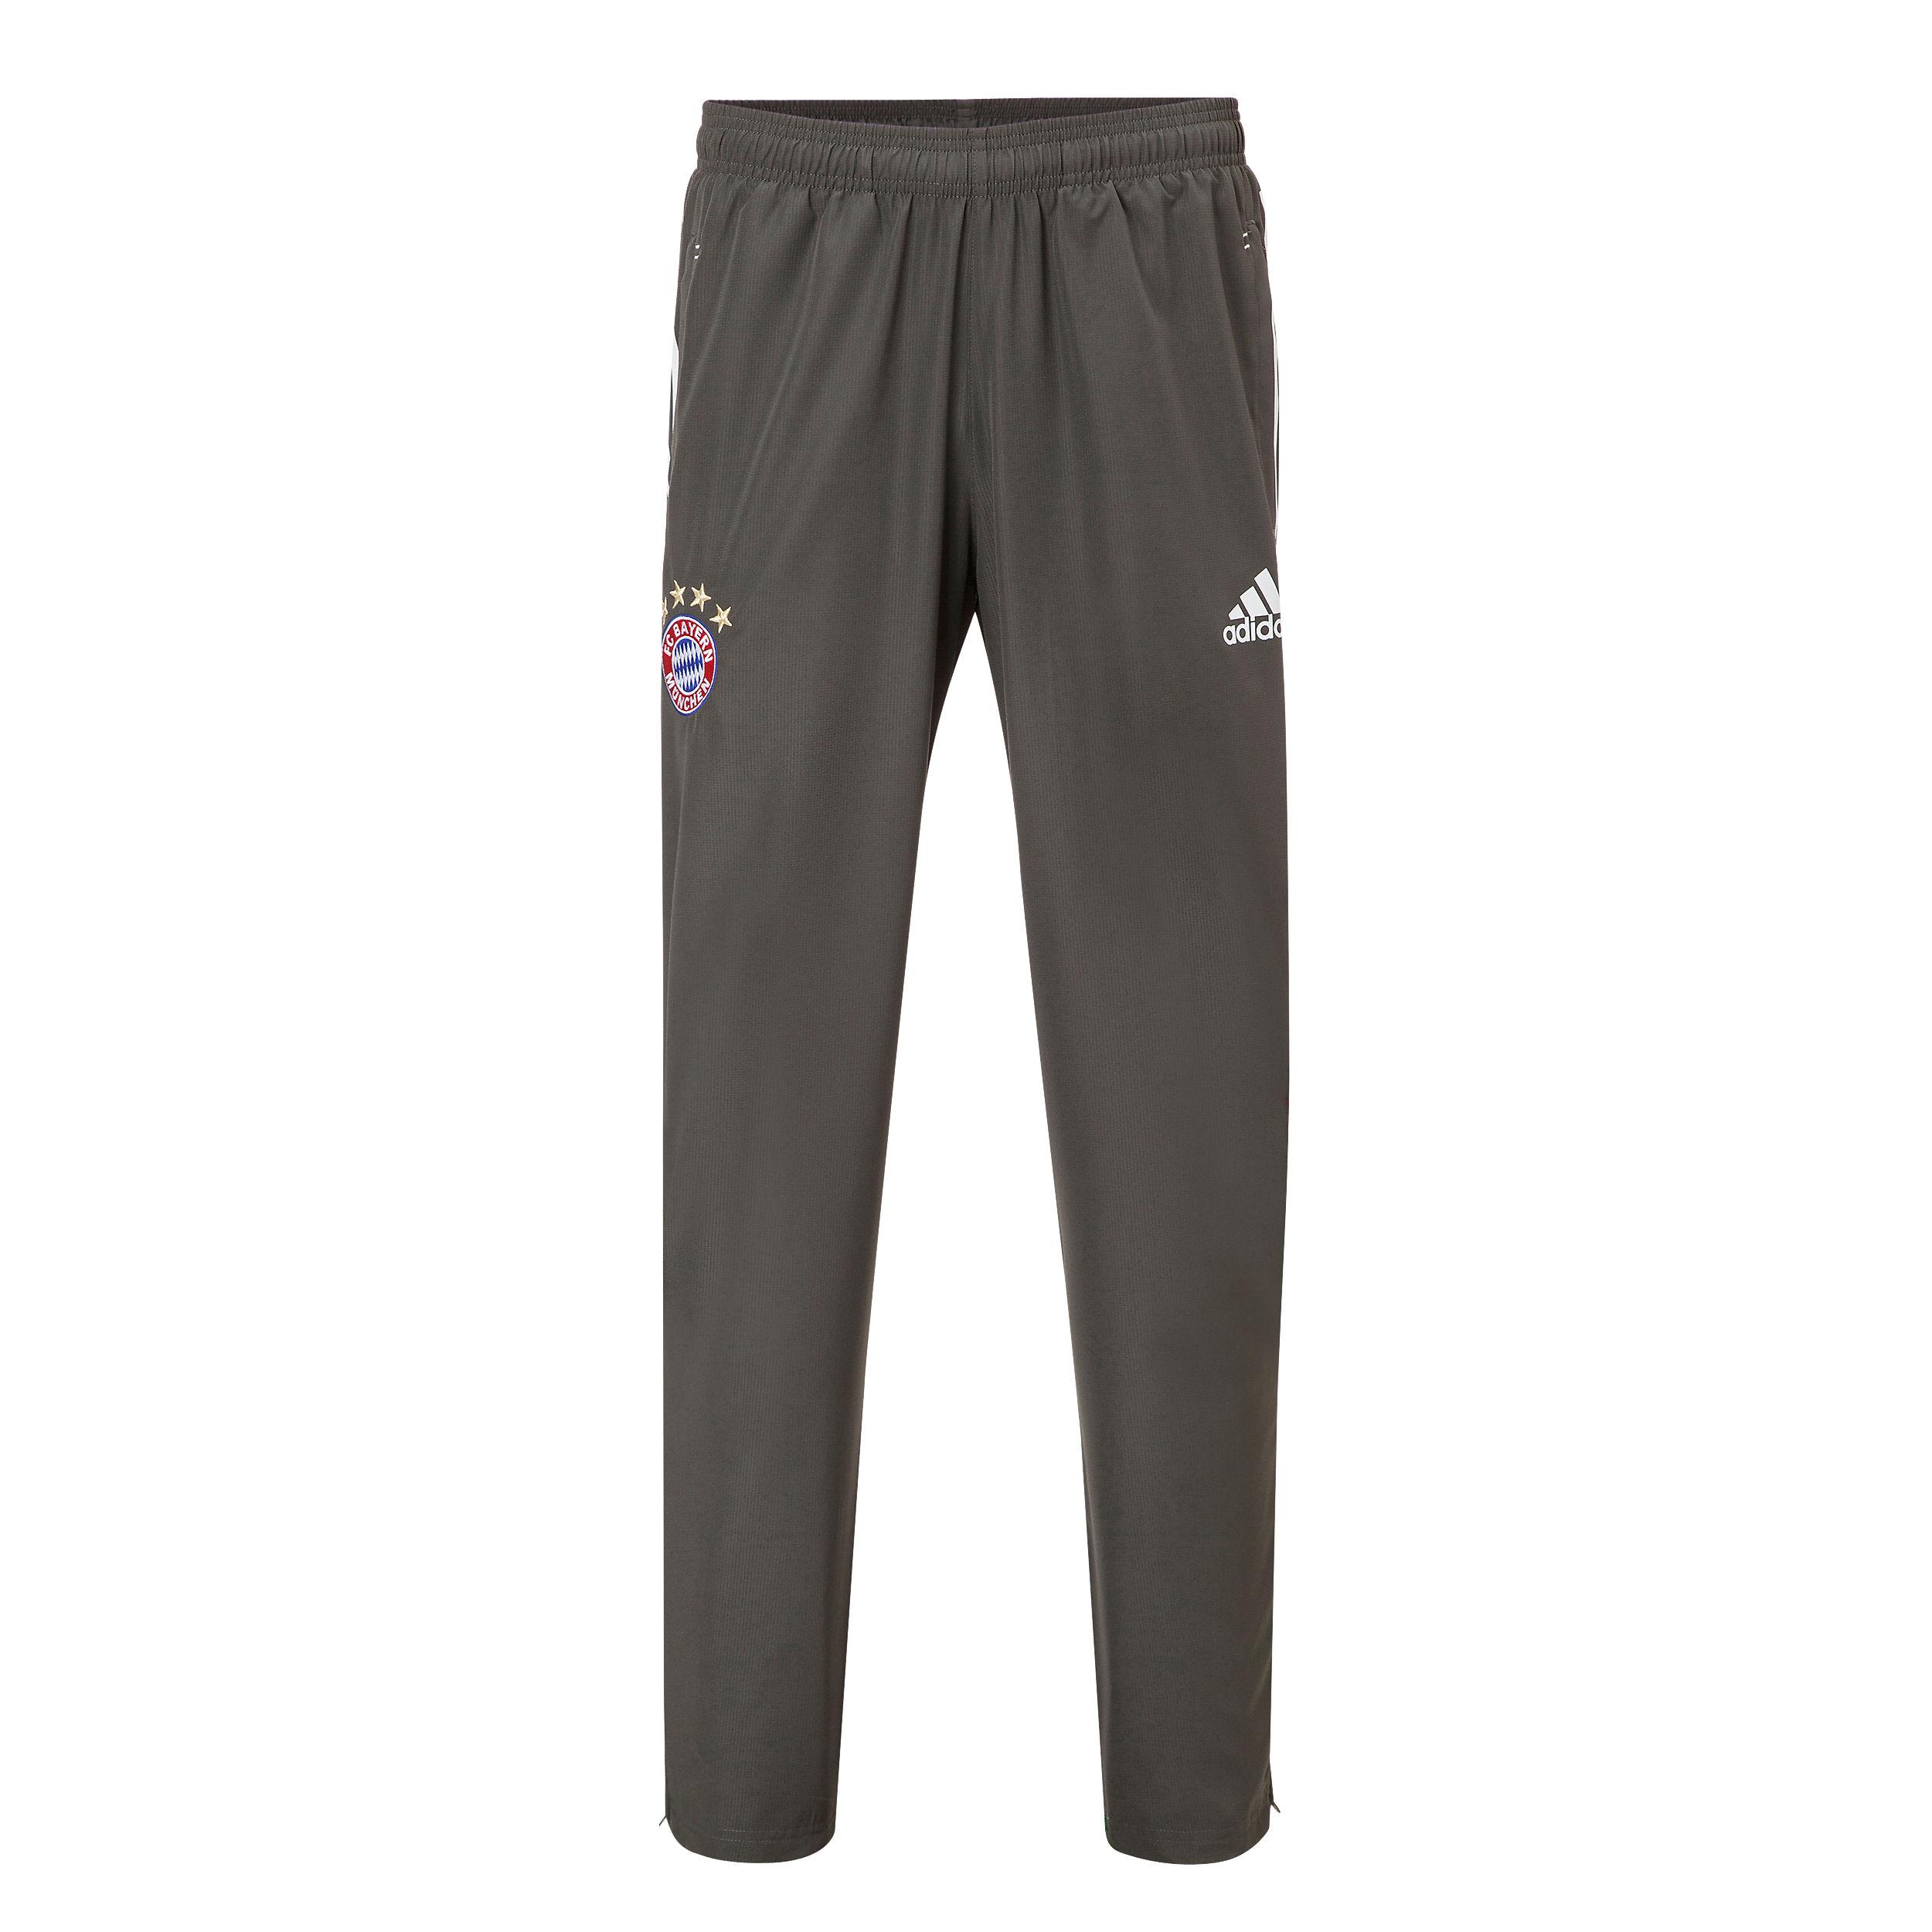 Adidas UCL Teamline Presentation Pants